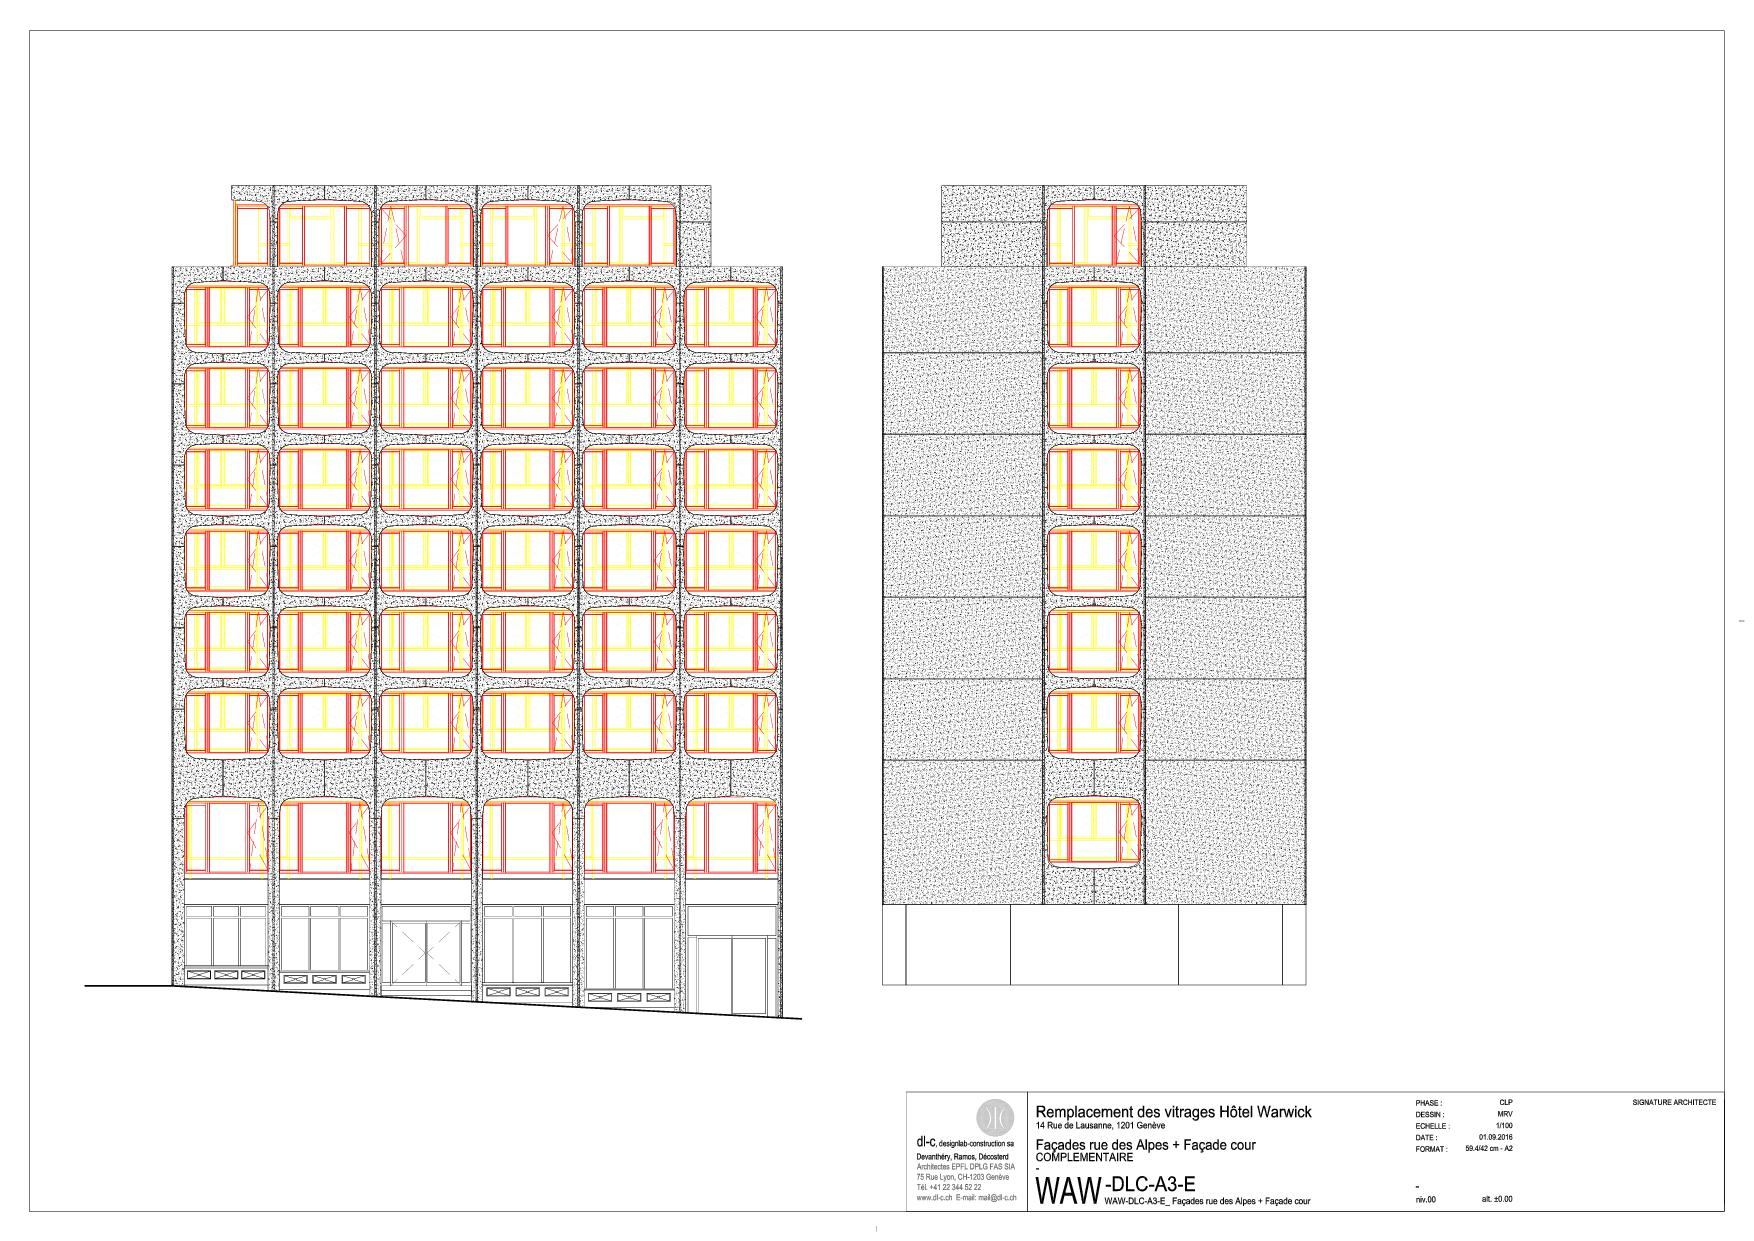 Façade Rue des Alpes Rénovation de façade à l'hôtel Warwick  de dl-c, designlab-construction sa